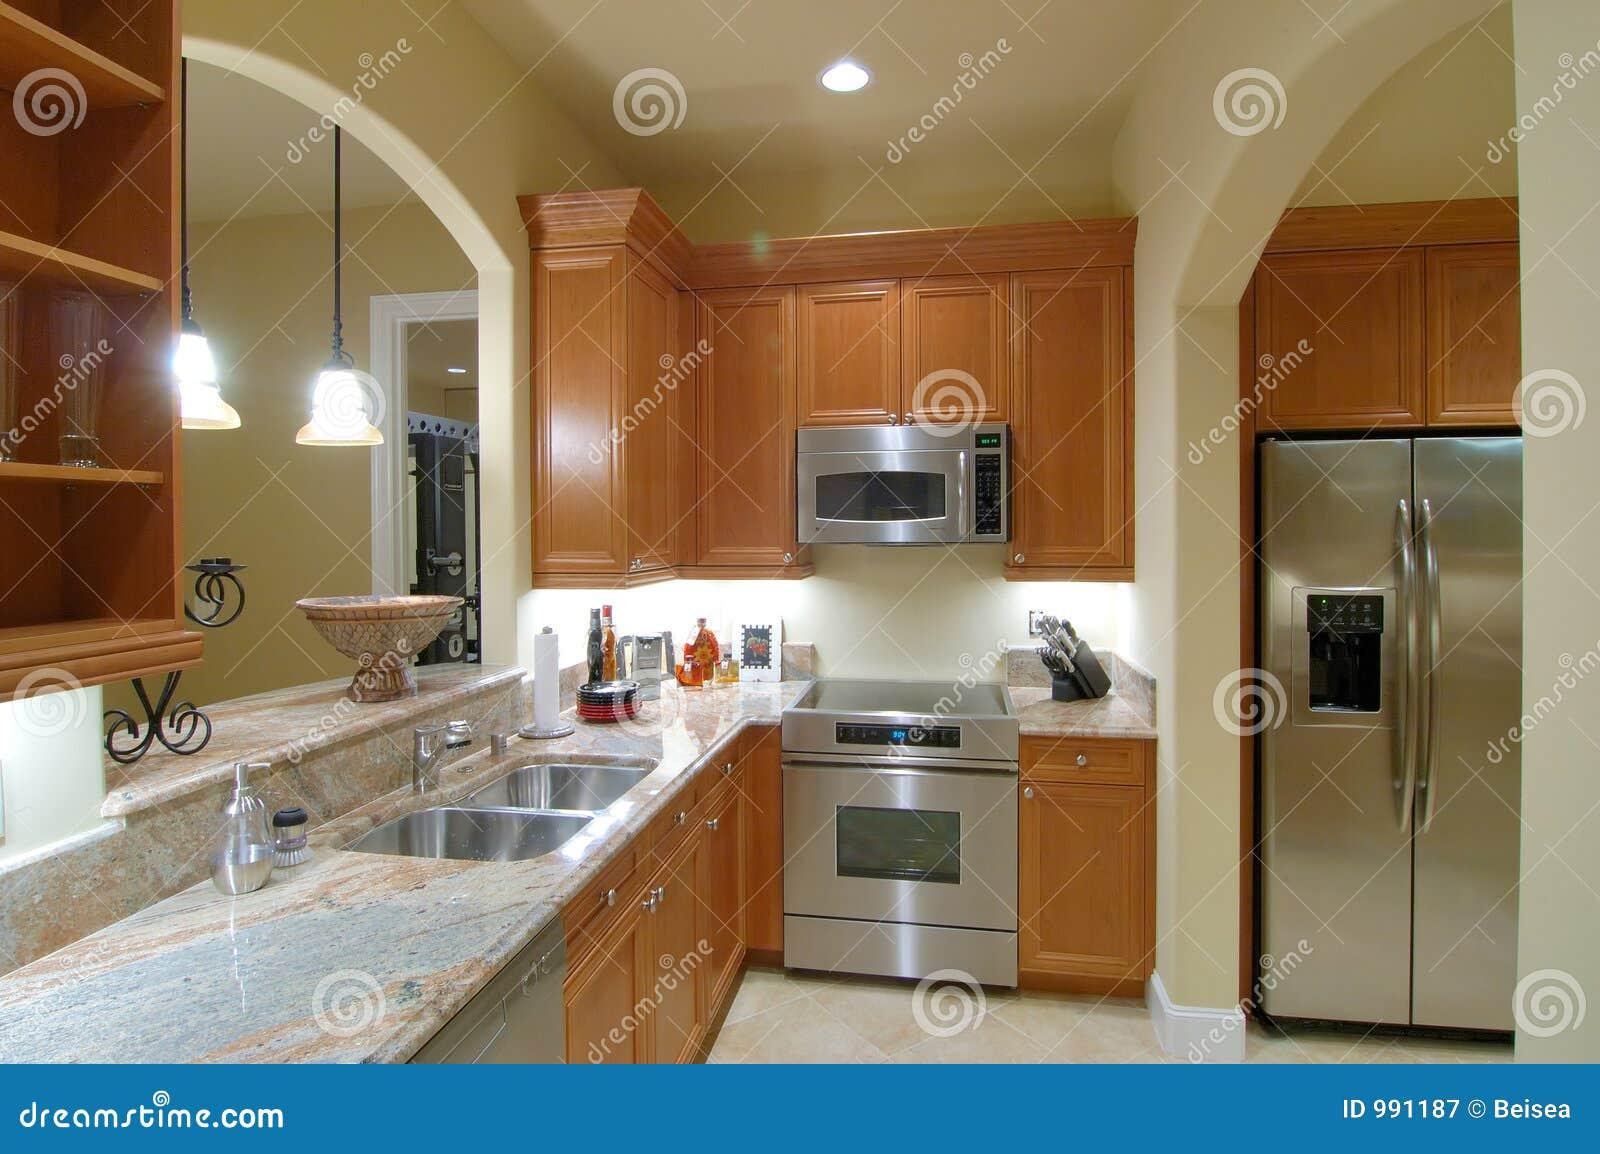 Küche Im Keller | Keller Kuche Stockbild Bild Von Wanne Formteil Mable 991187